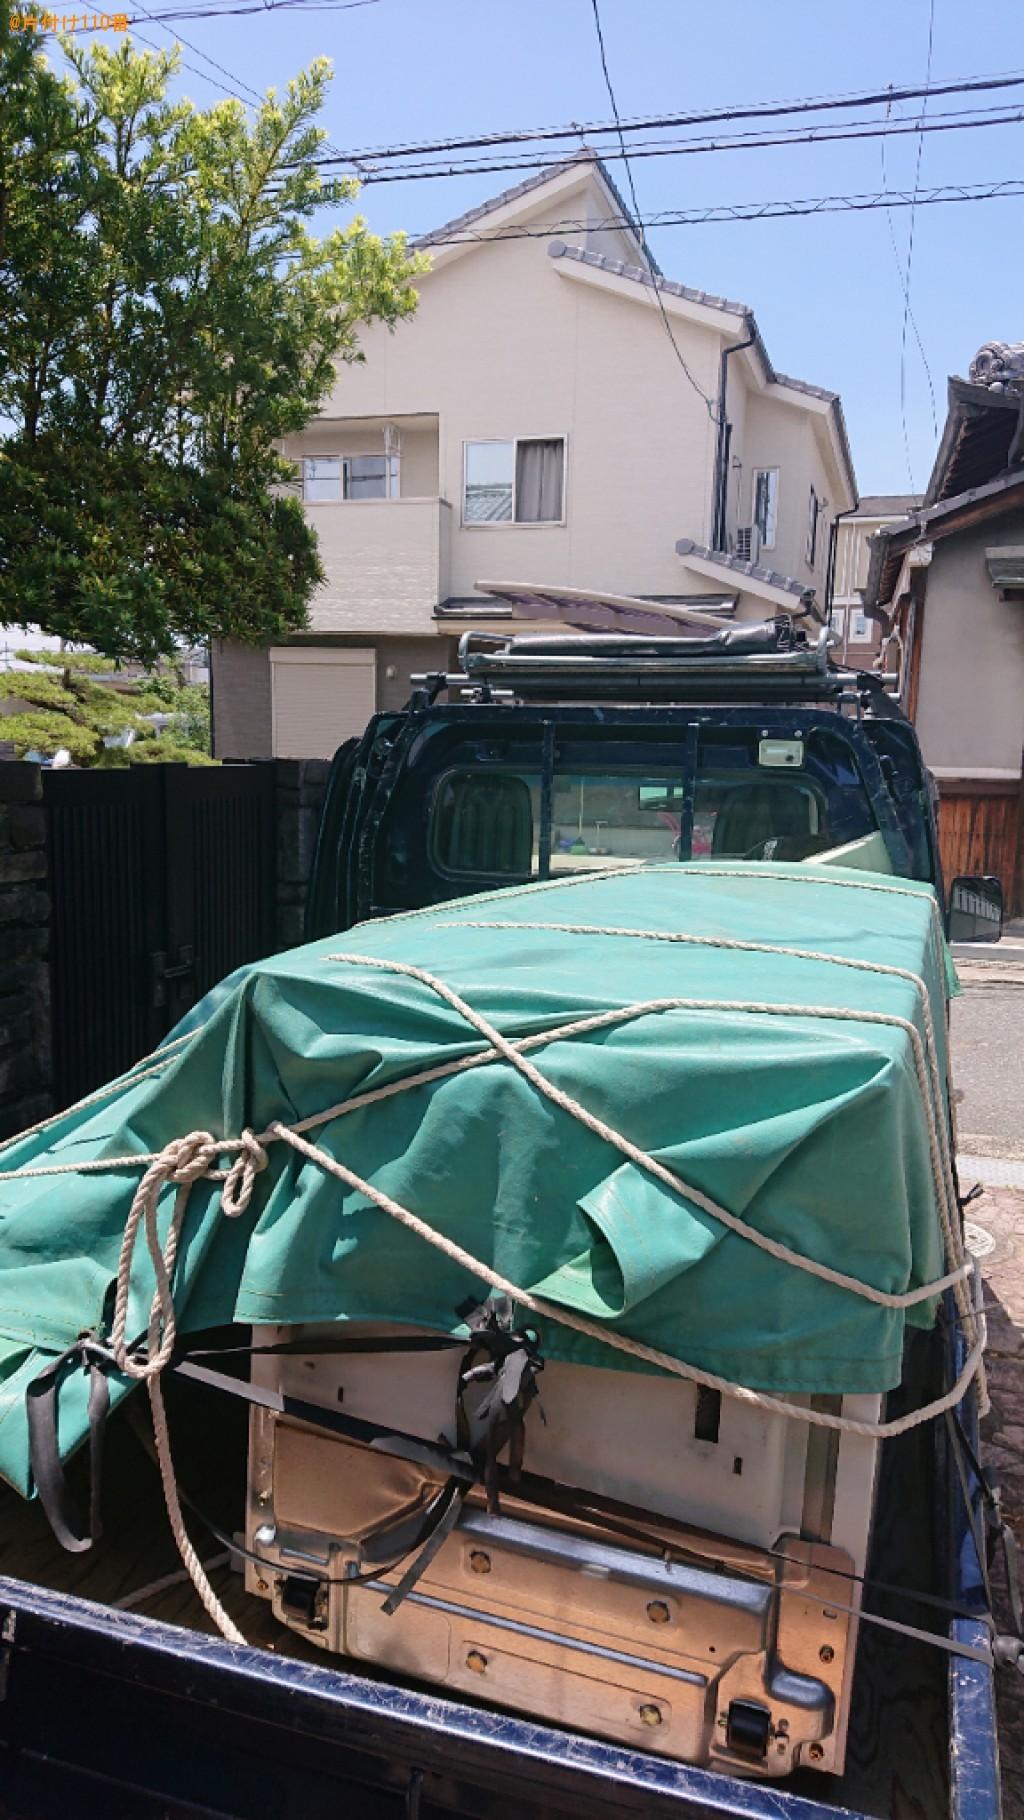 【大和郡山市】冷蔵庫、洗濯機の回収・処分ご依頼 お客様の声